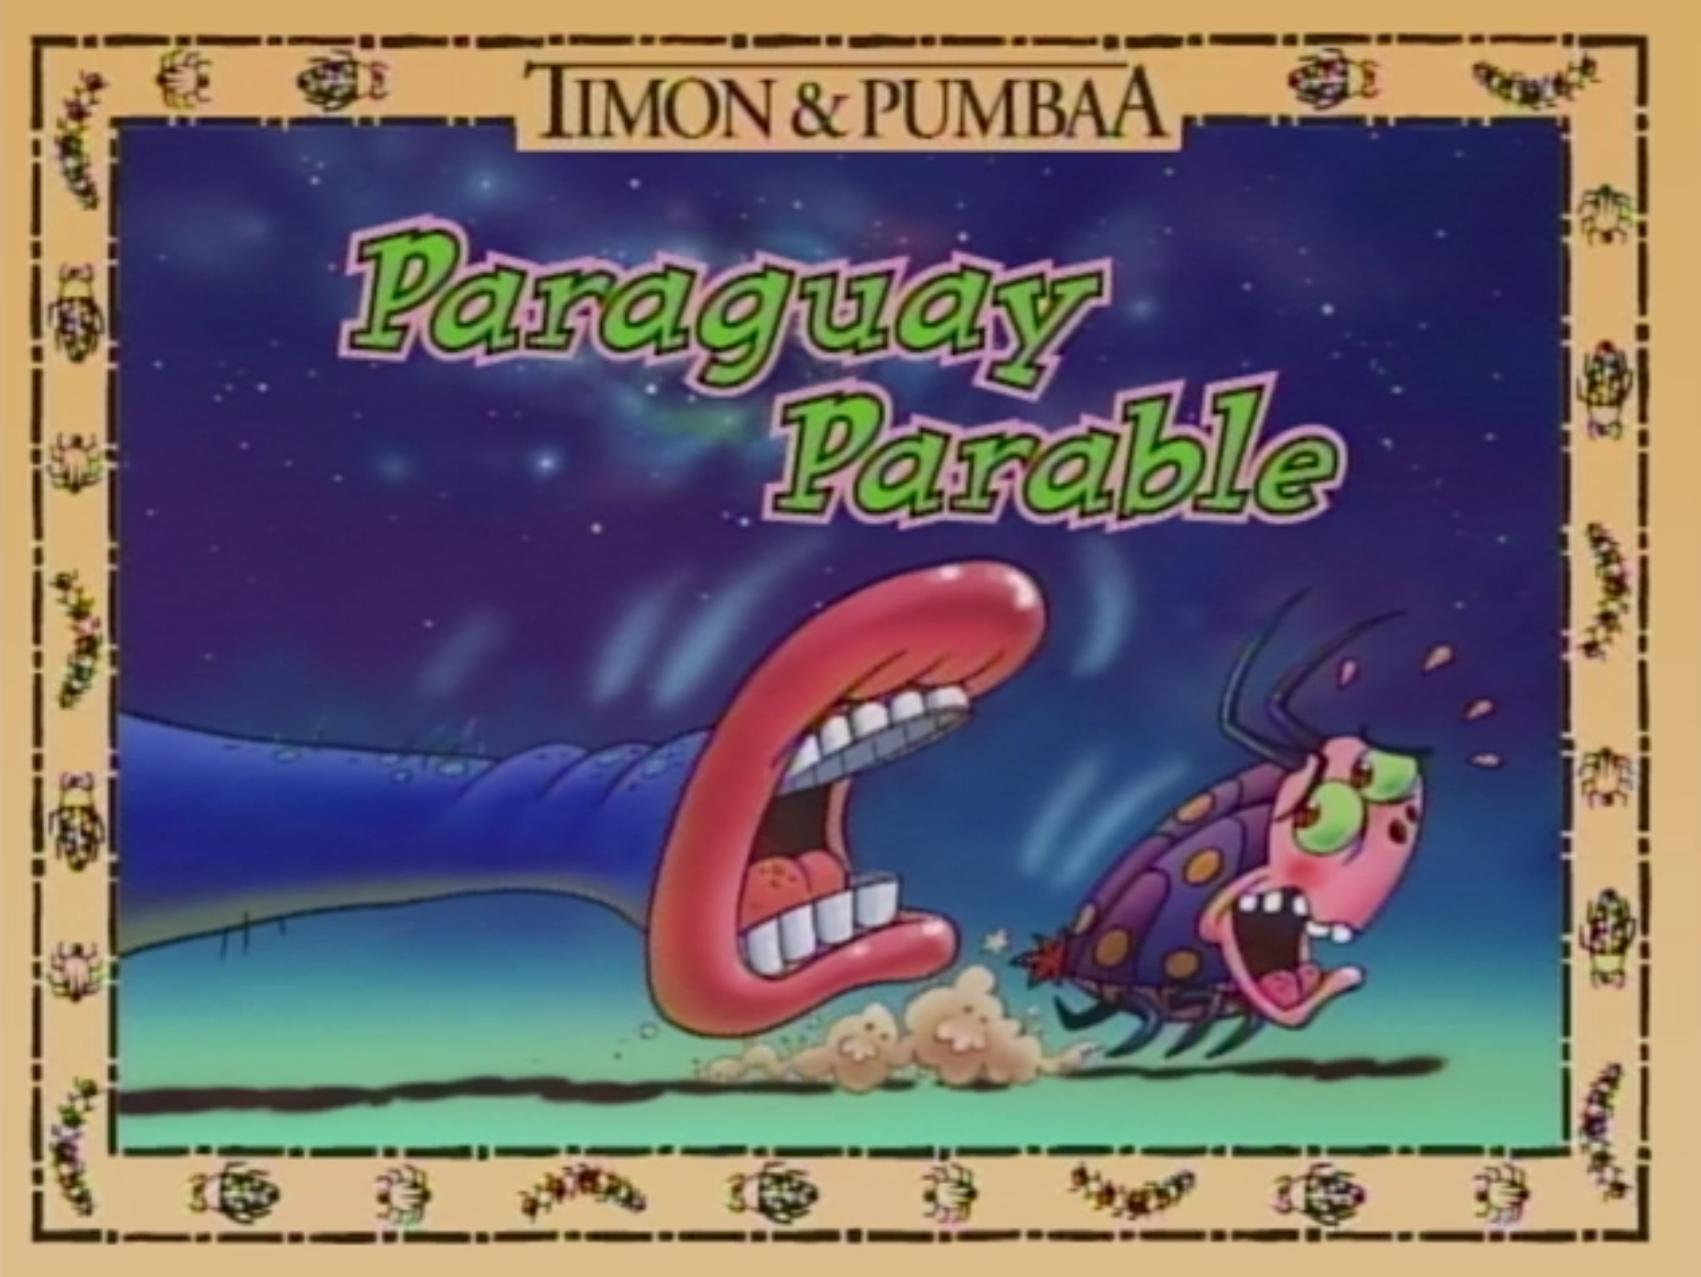 Paraguay Parable